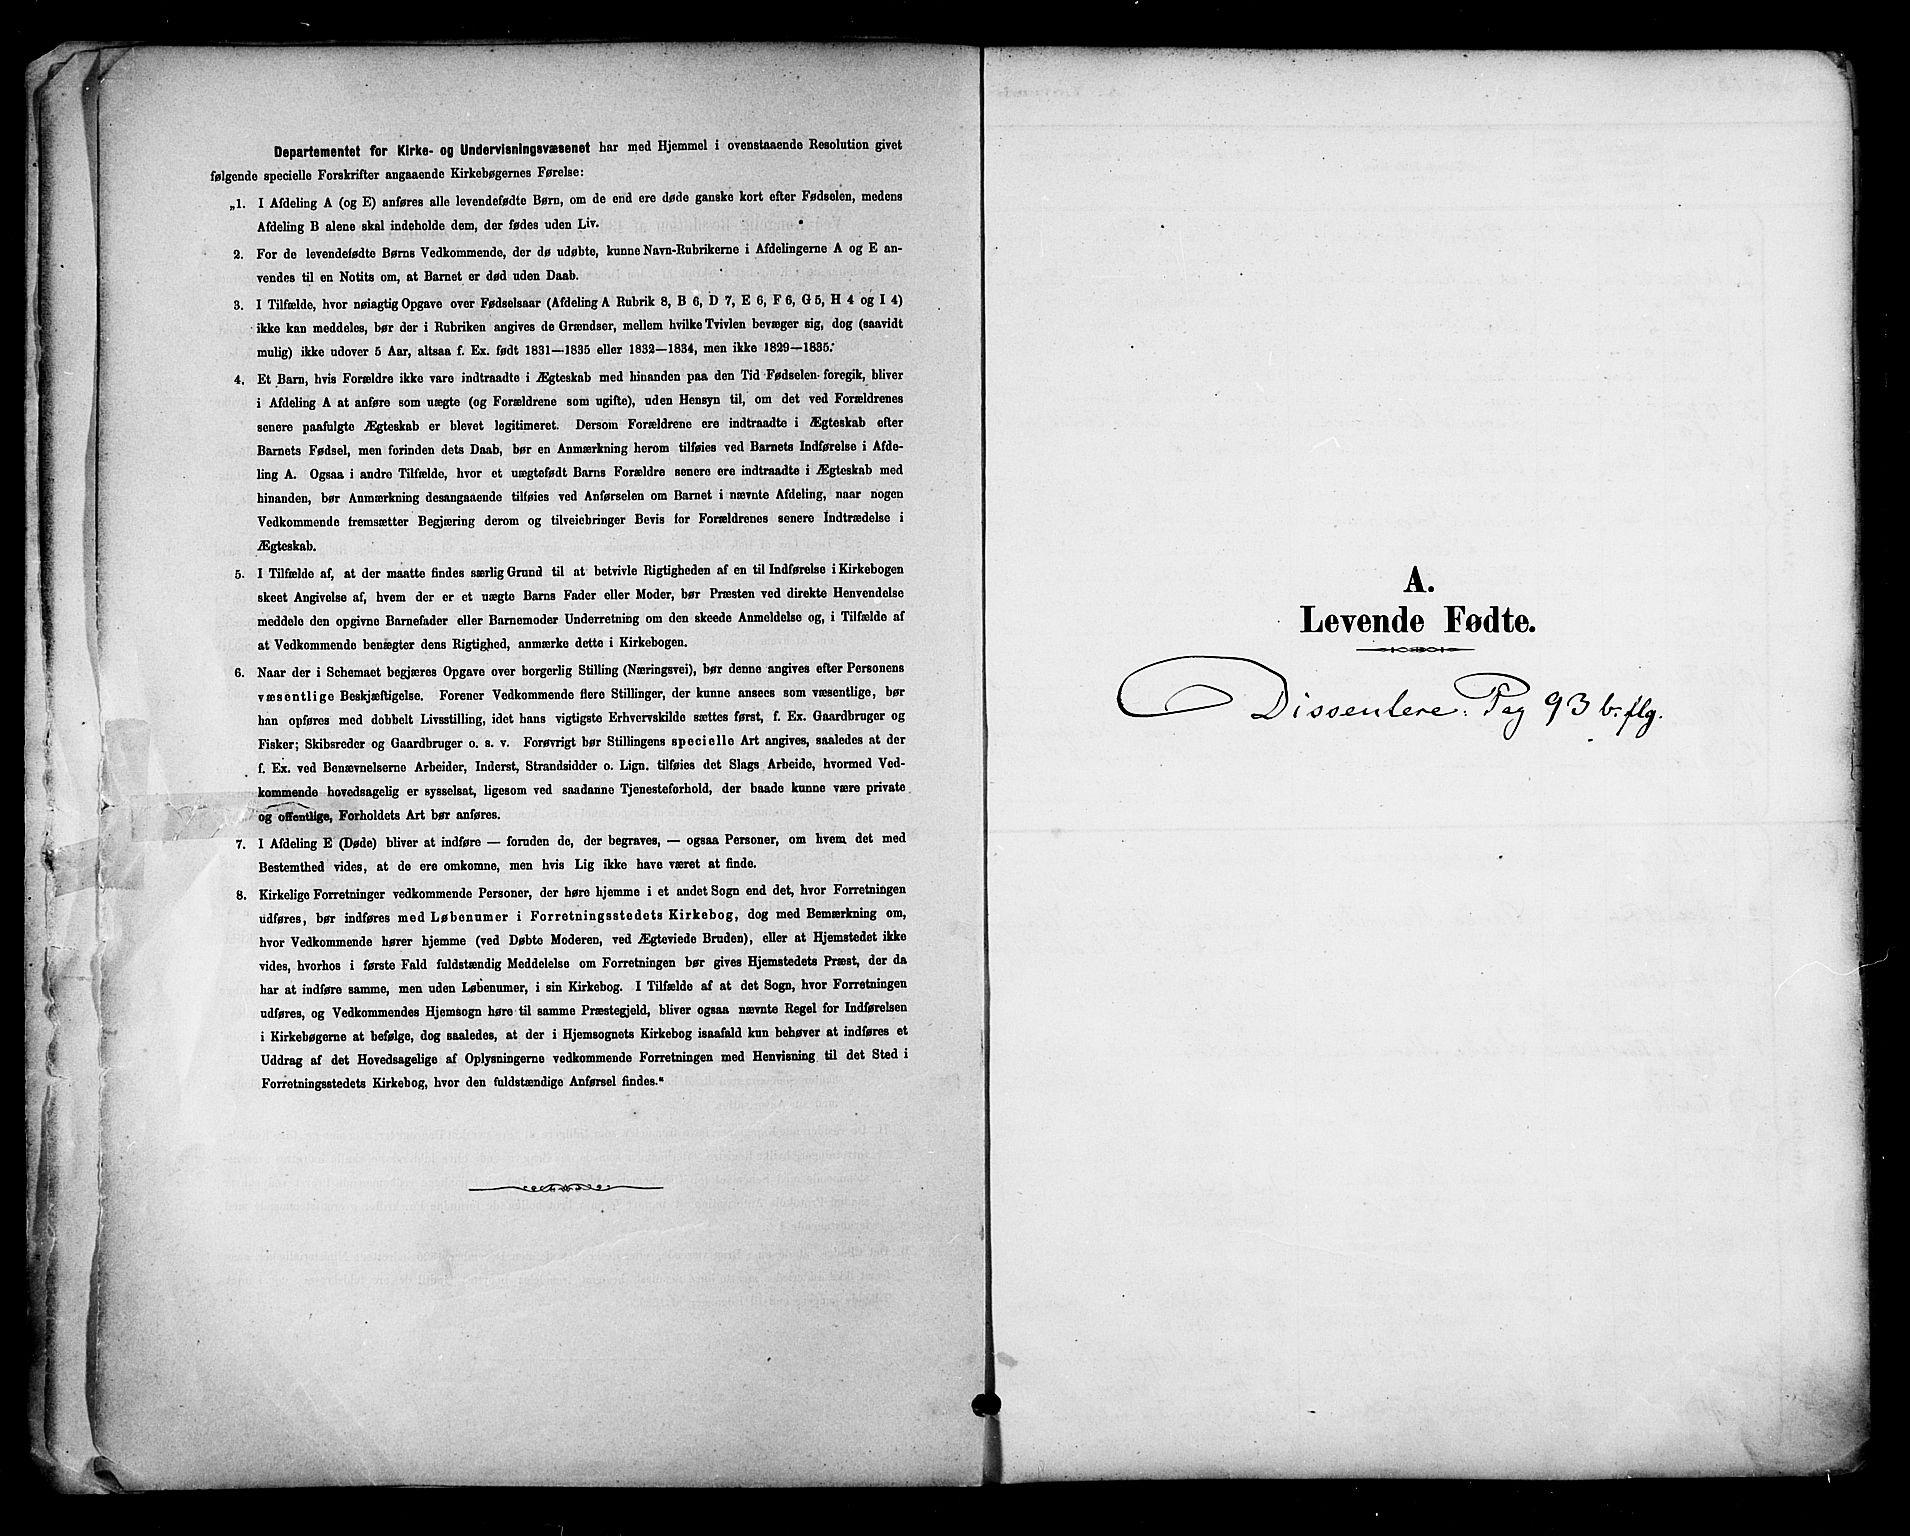 SAT, Ministerialprotokoller, klokkerbøker og fødselsregistre - Nordland, 813/L0200: Ministerialbok nr. 813A10, 1886-1900